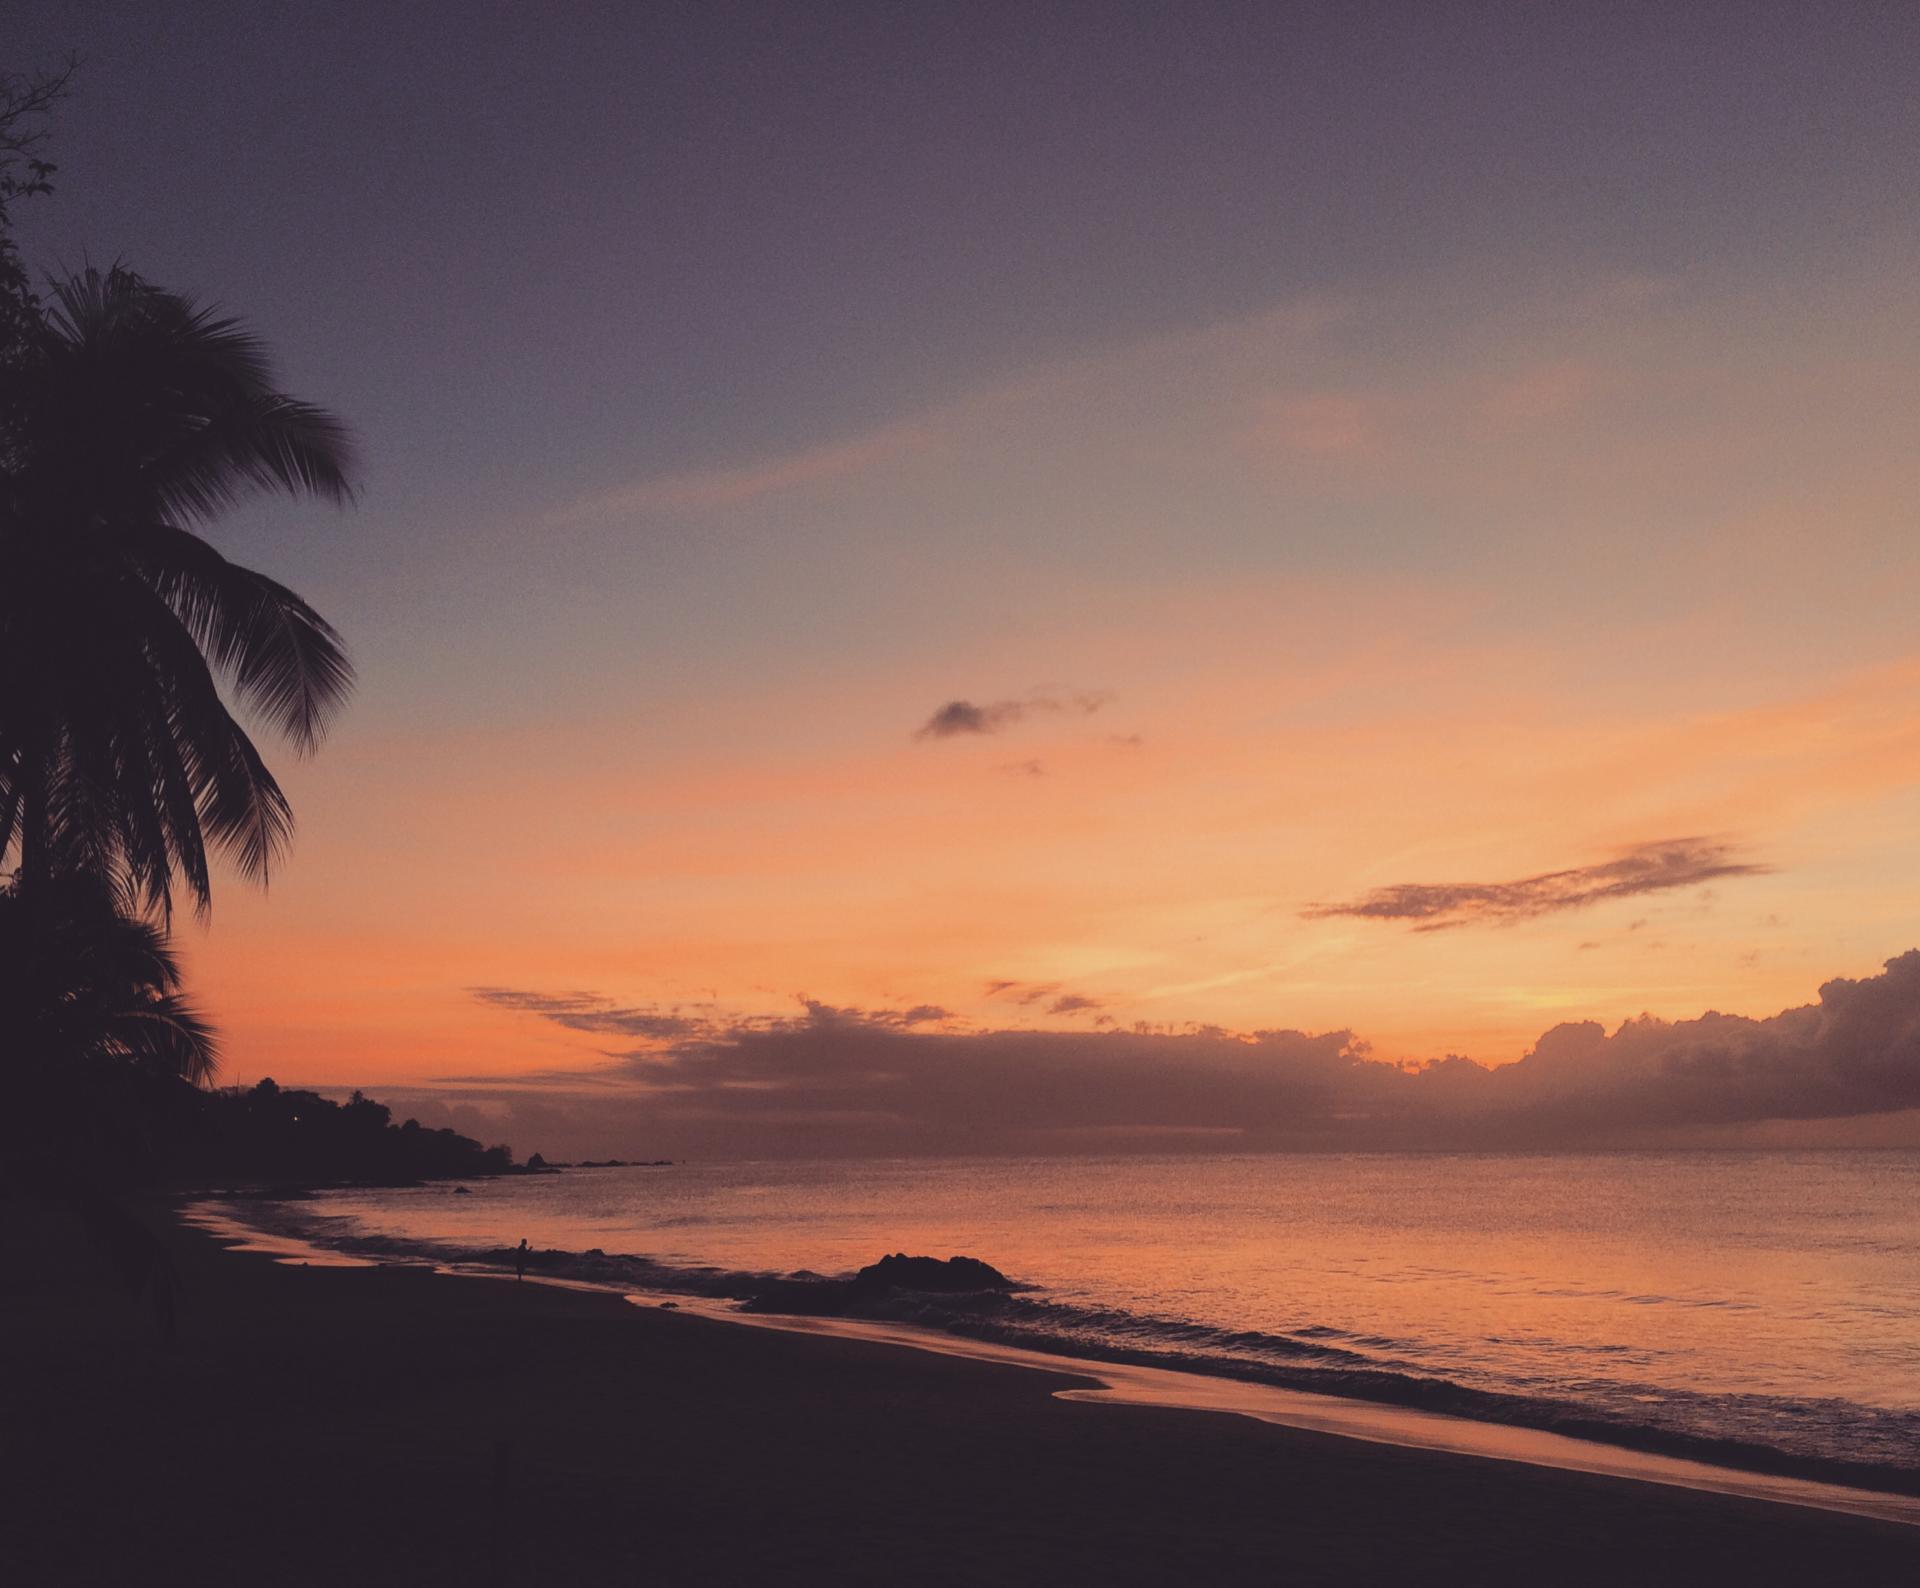 Sunset Grafton Beach Tobago Caribbean Sea